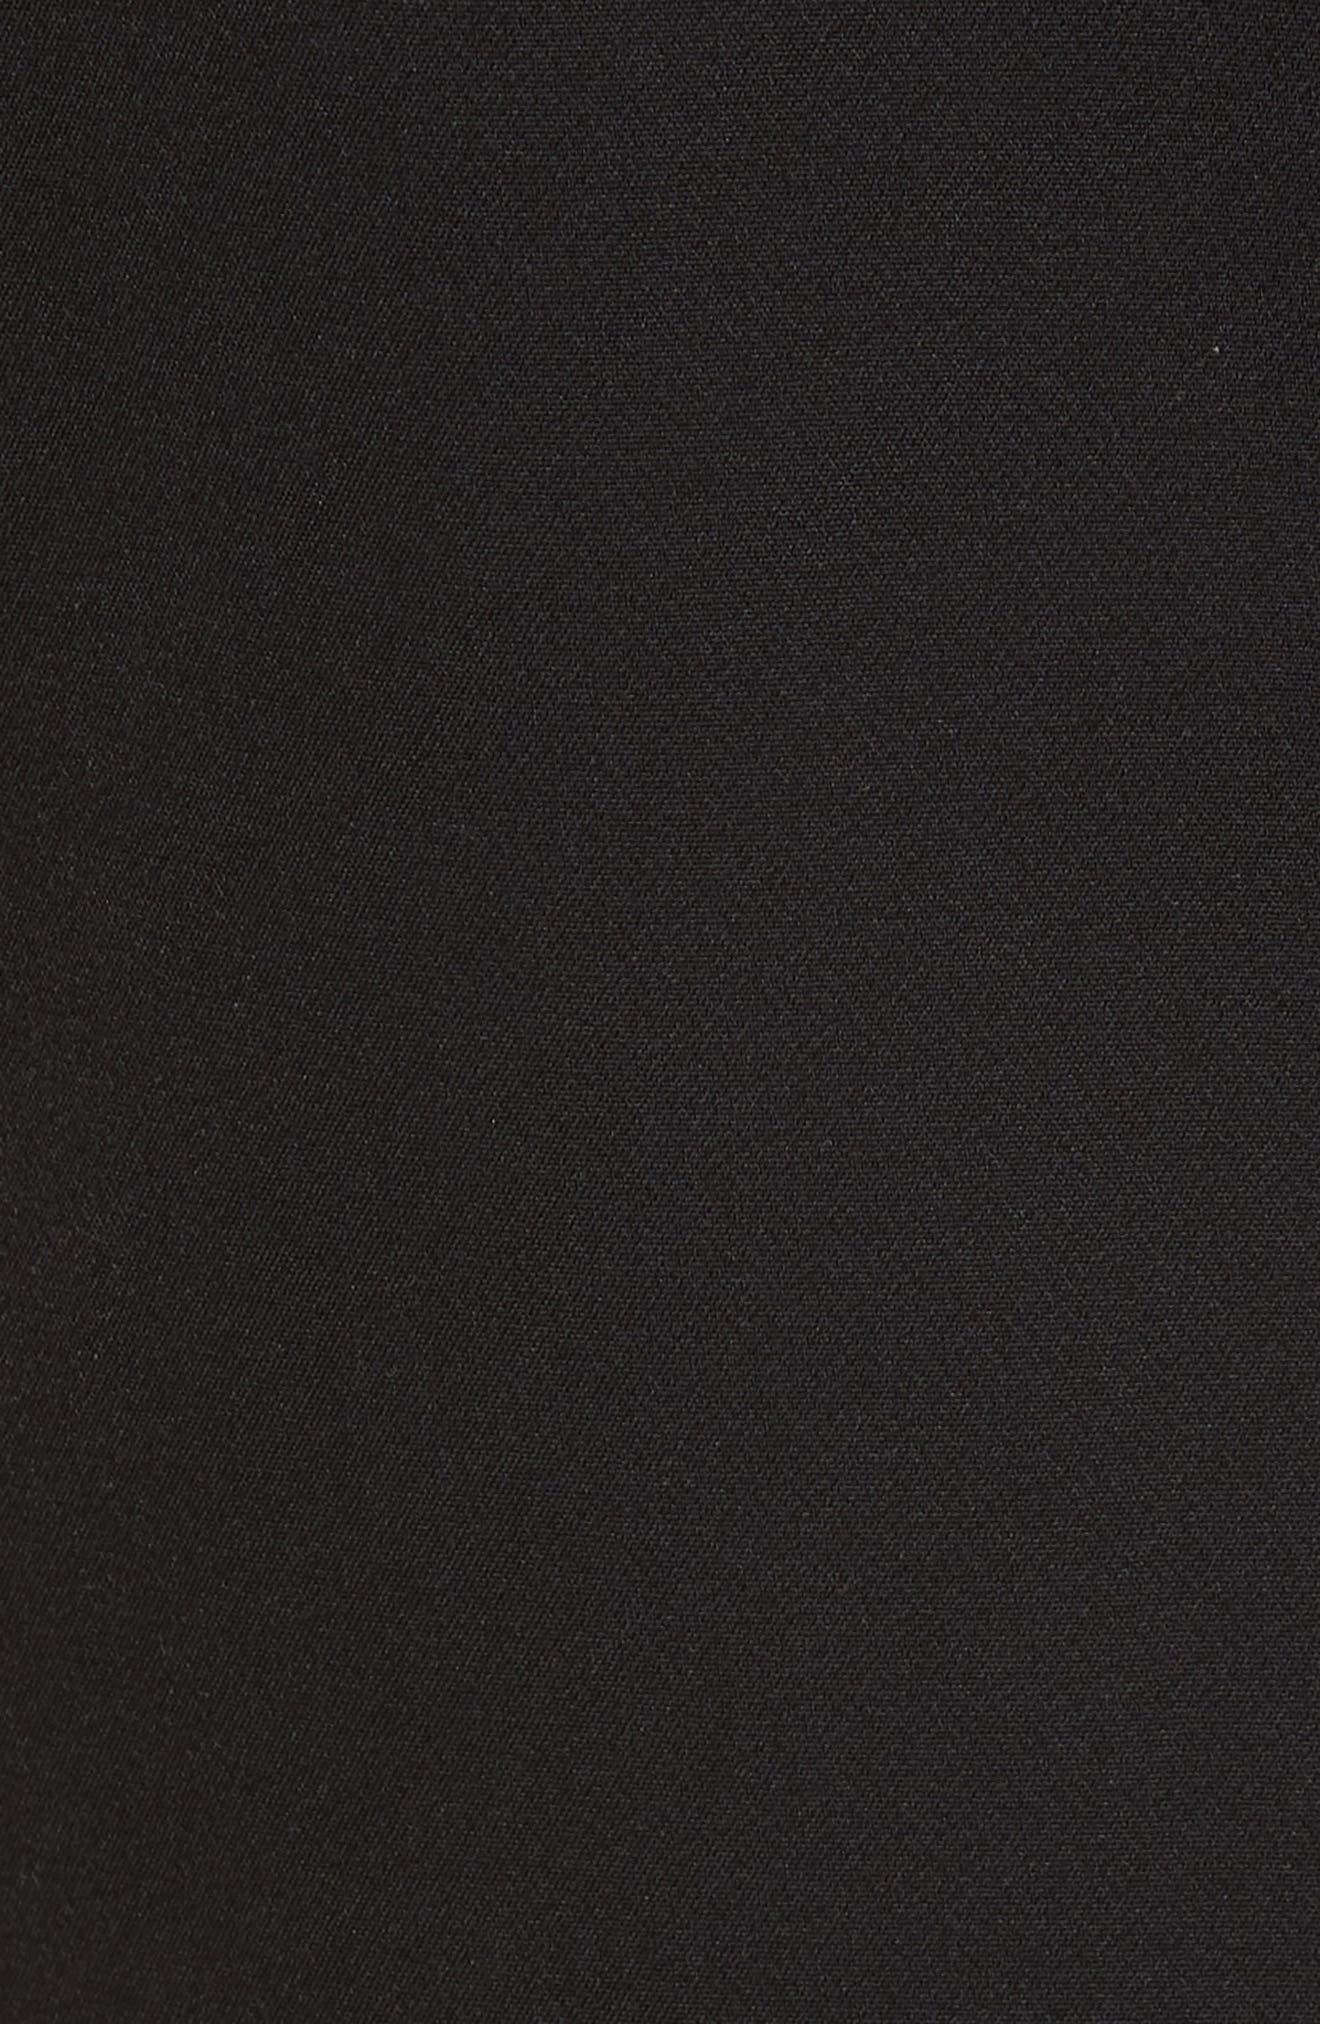 Flare Hem Dress,                             Alternate thumbnail 5, color,                             001